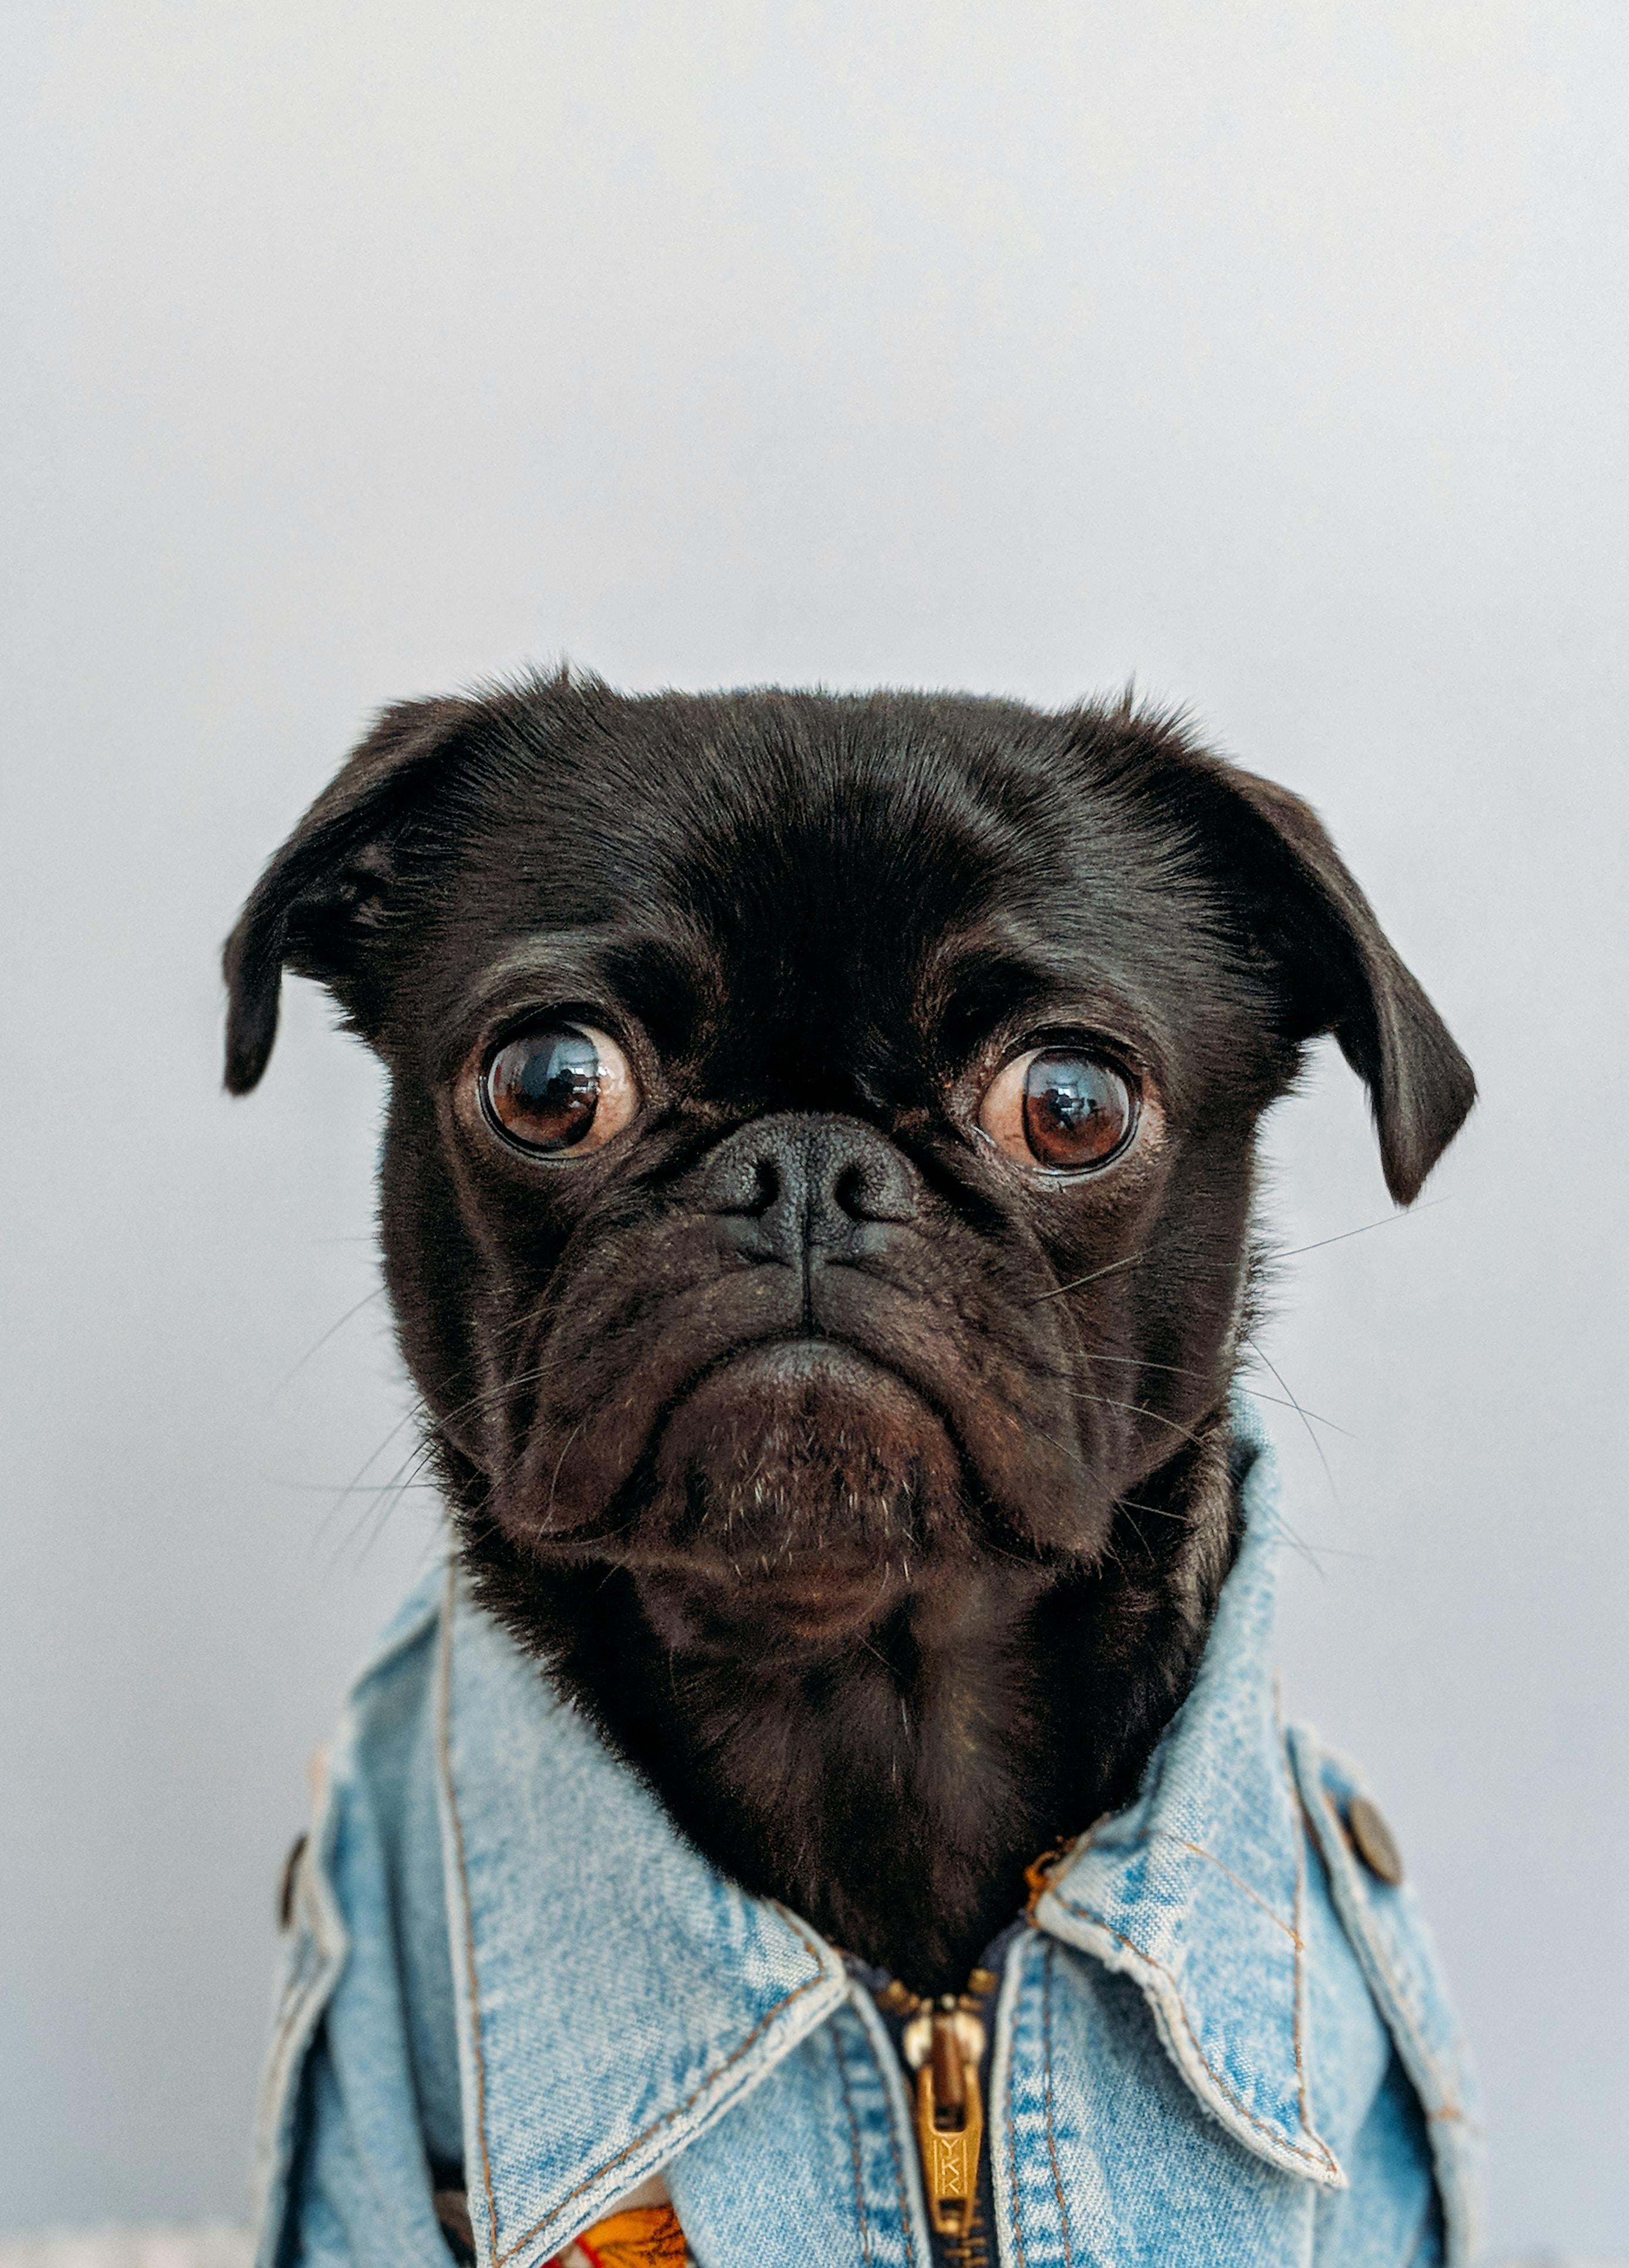 black dog wearing blue denim collar